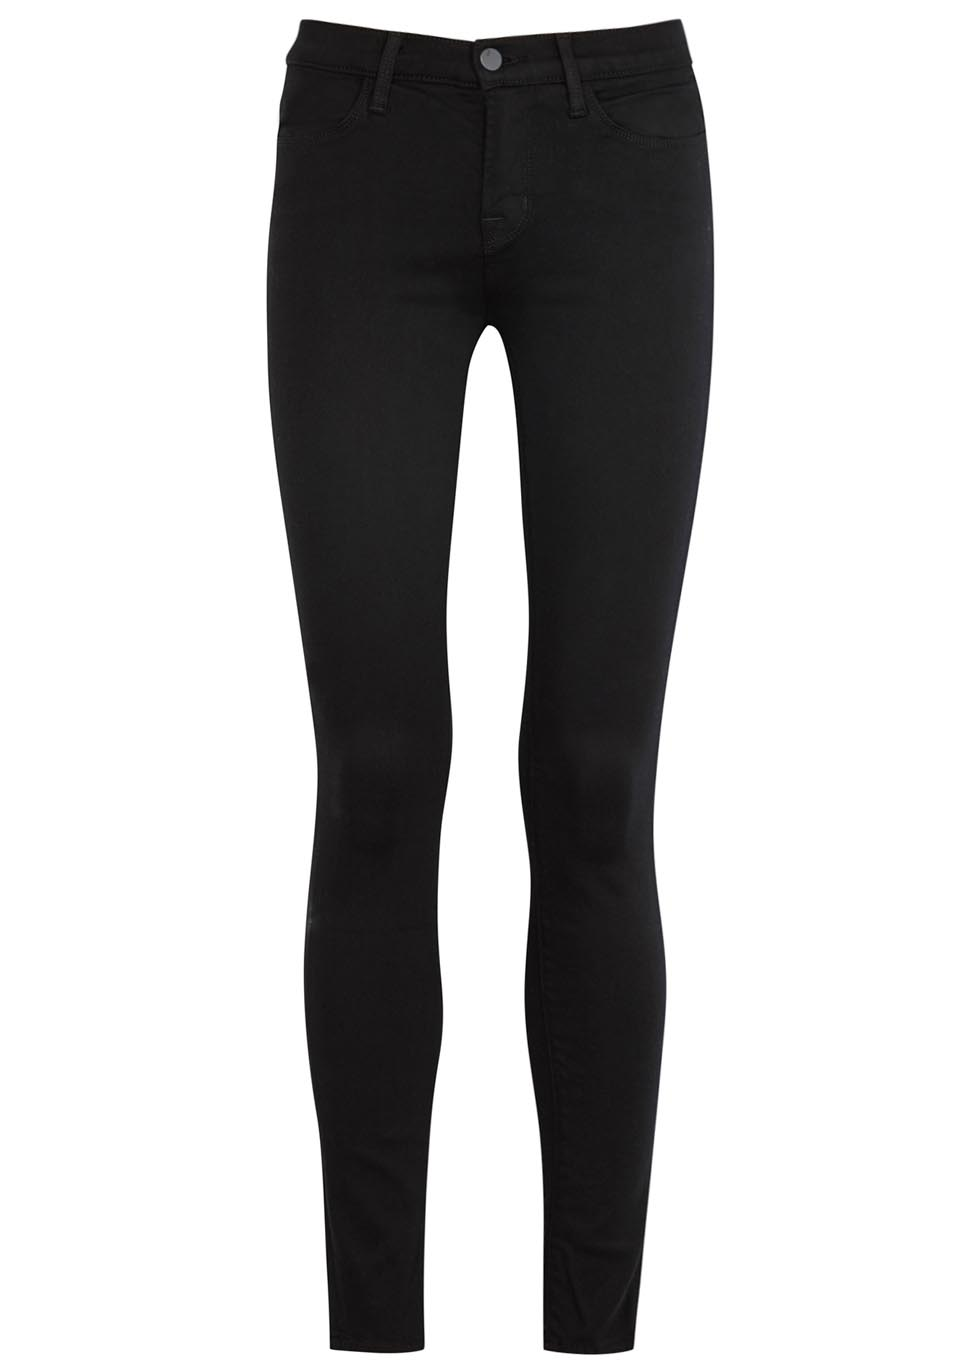 Super Skinny black skinny jeans - J Brand